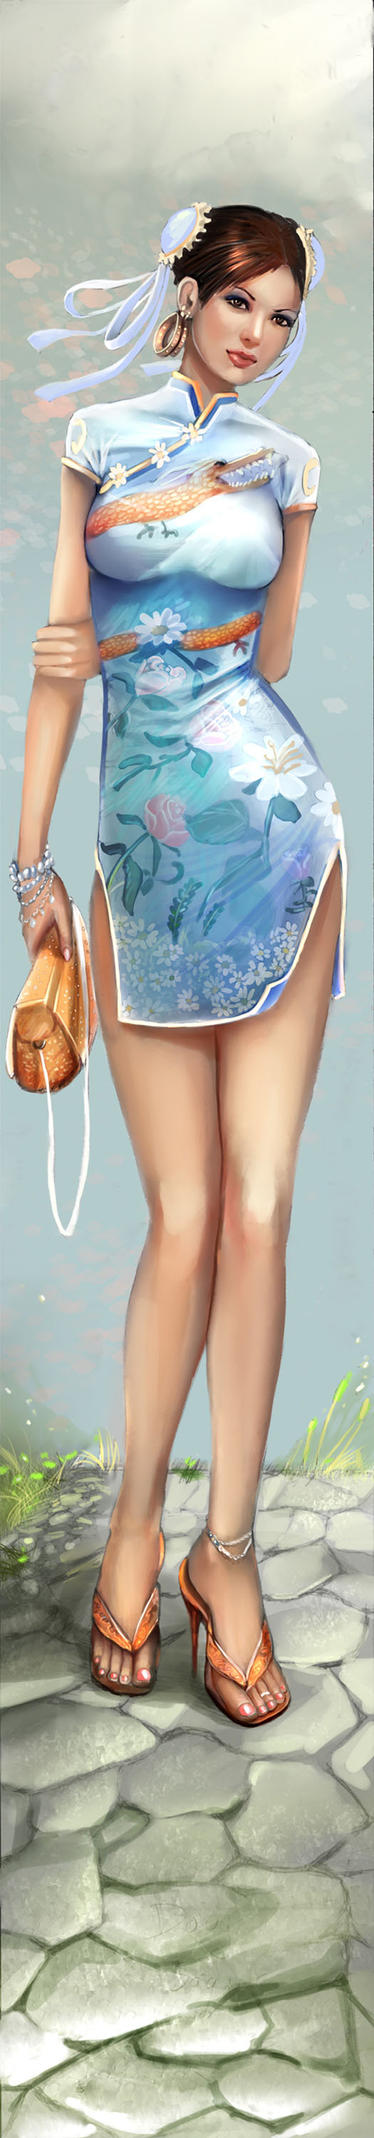 Chun Li Dress Colored by DougSQ